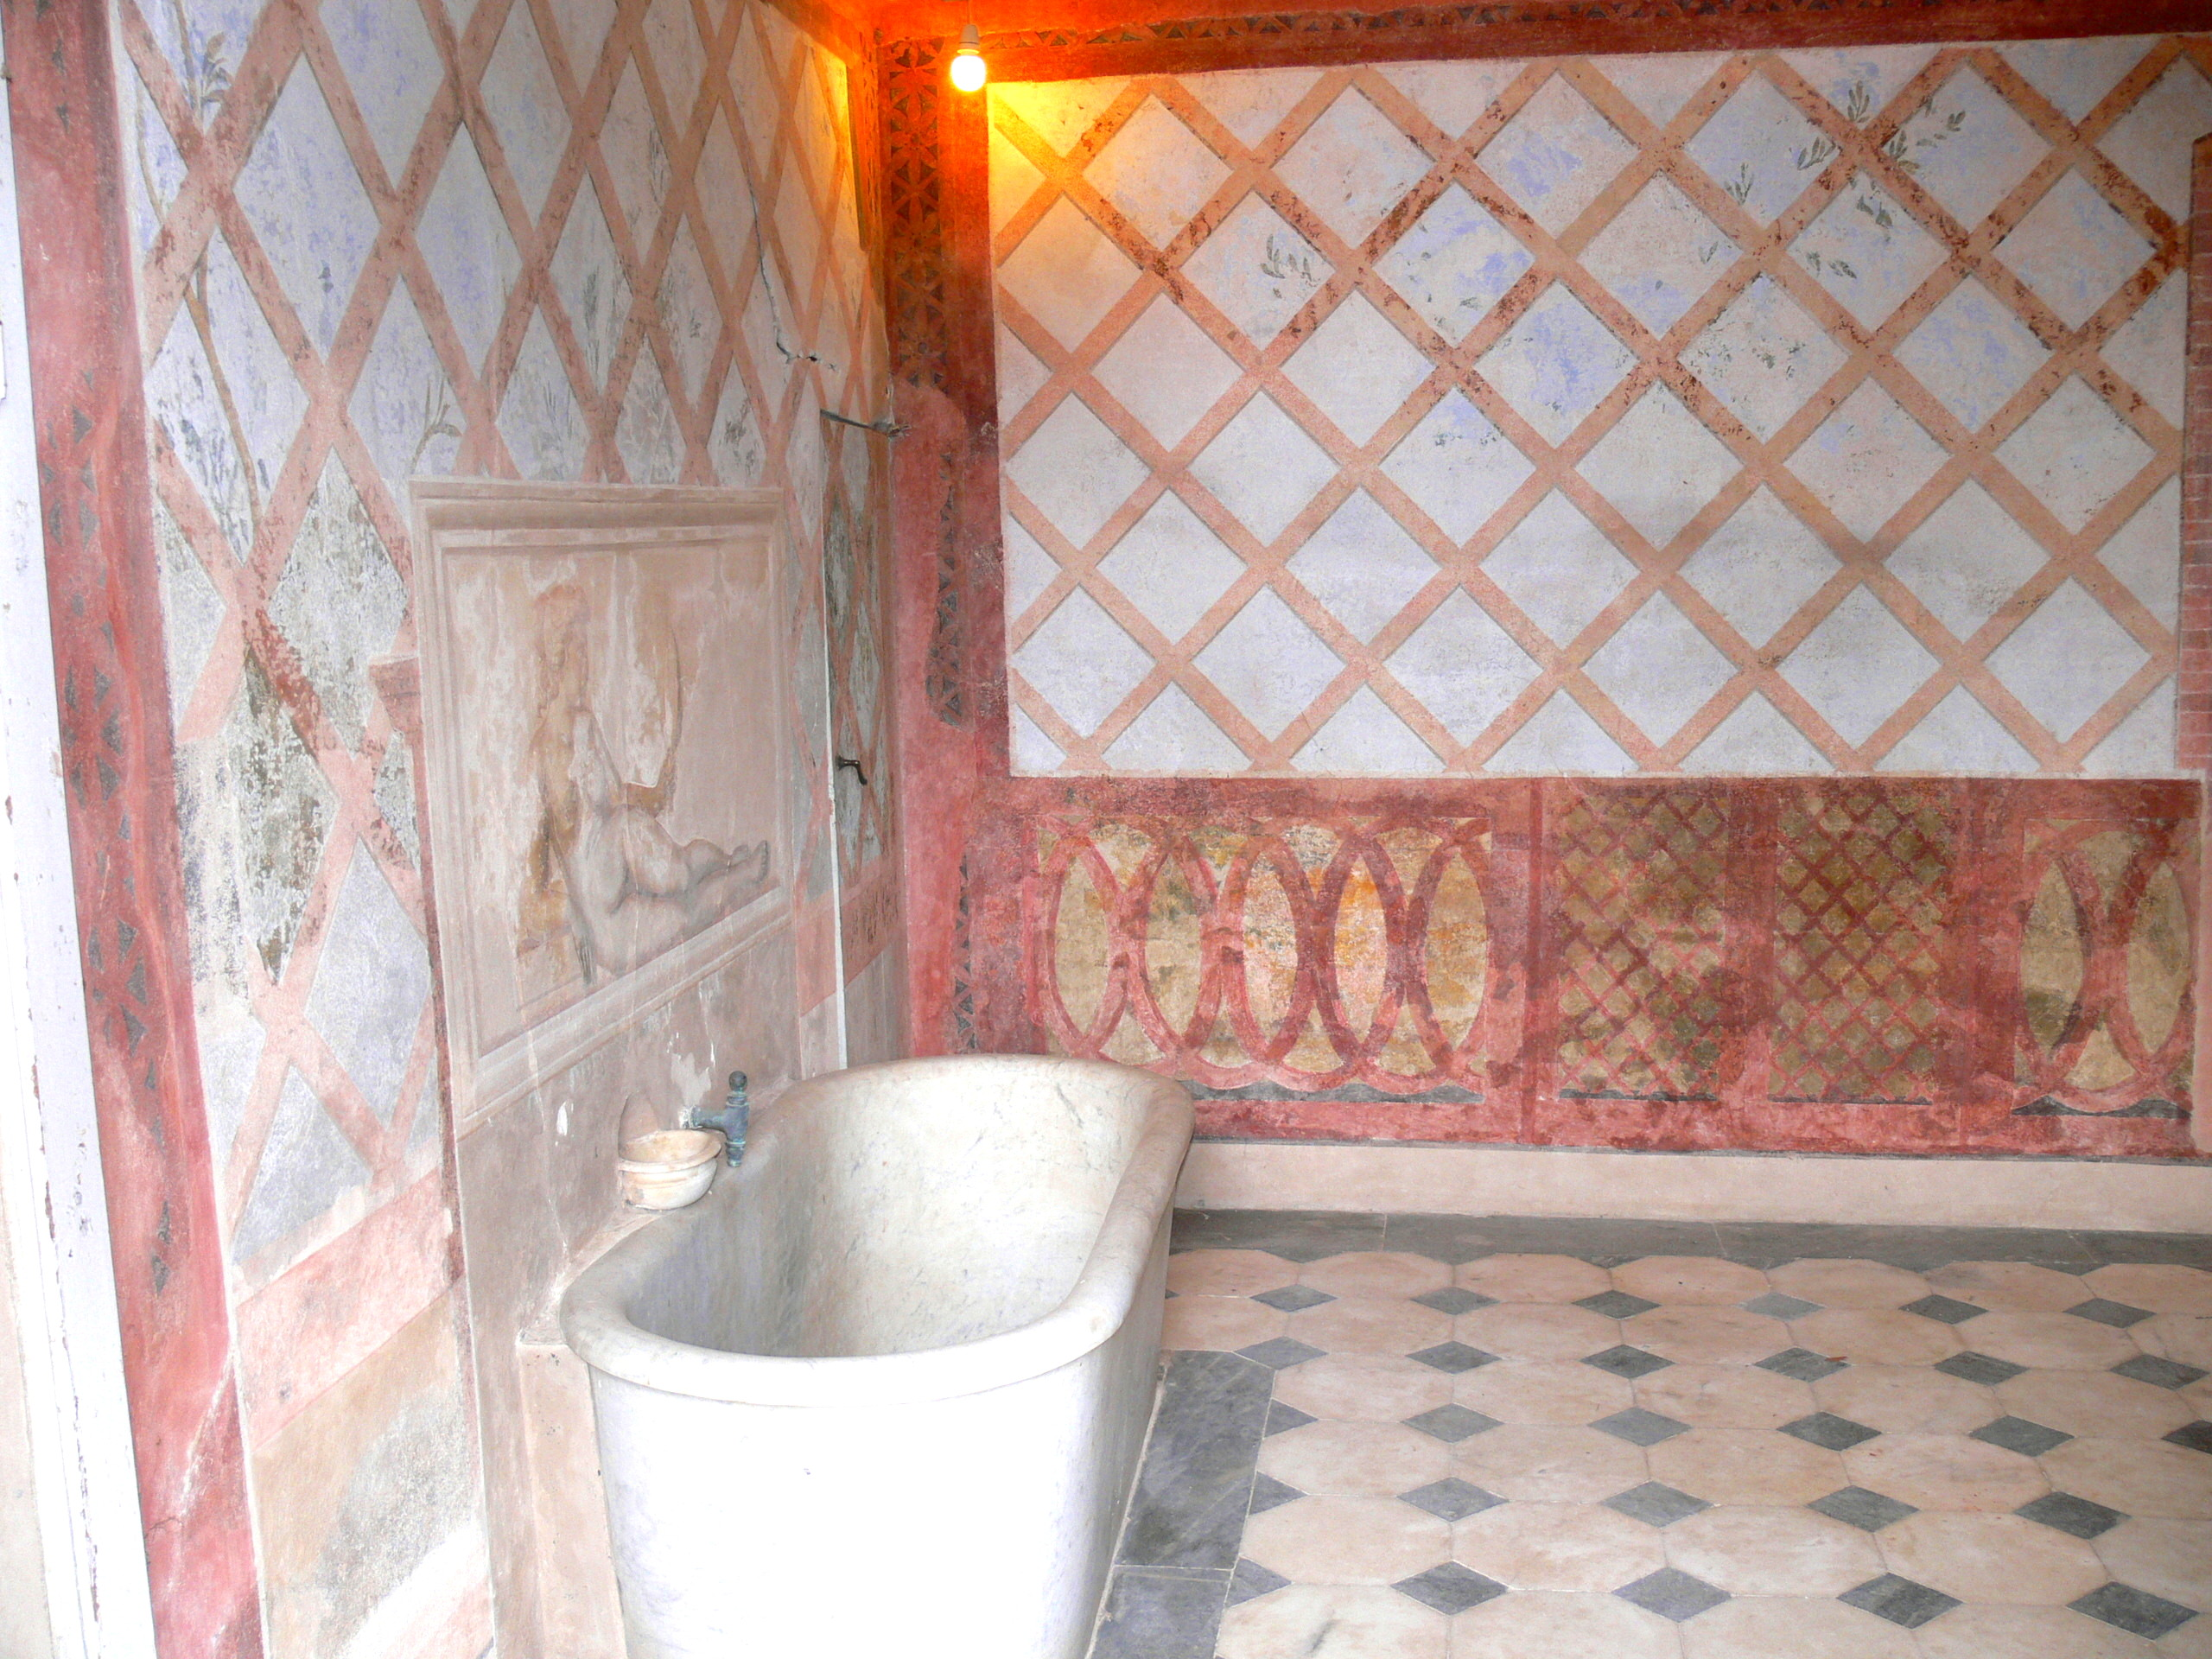 File:San Martino   Napoleons Haus Badezimmer